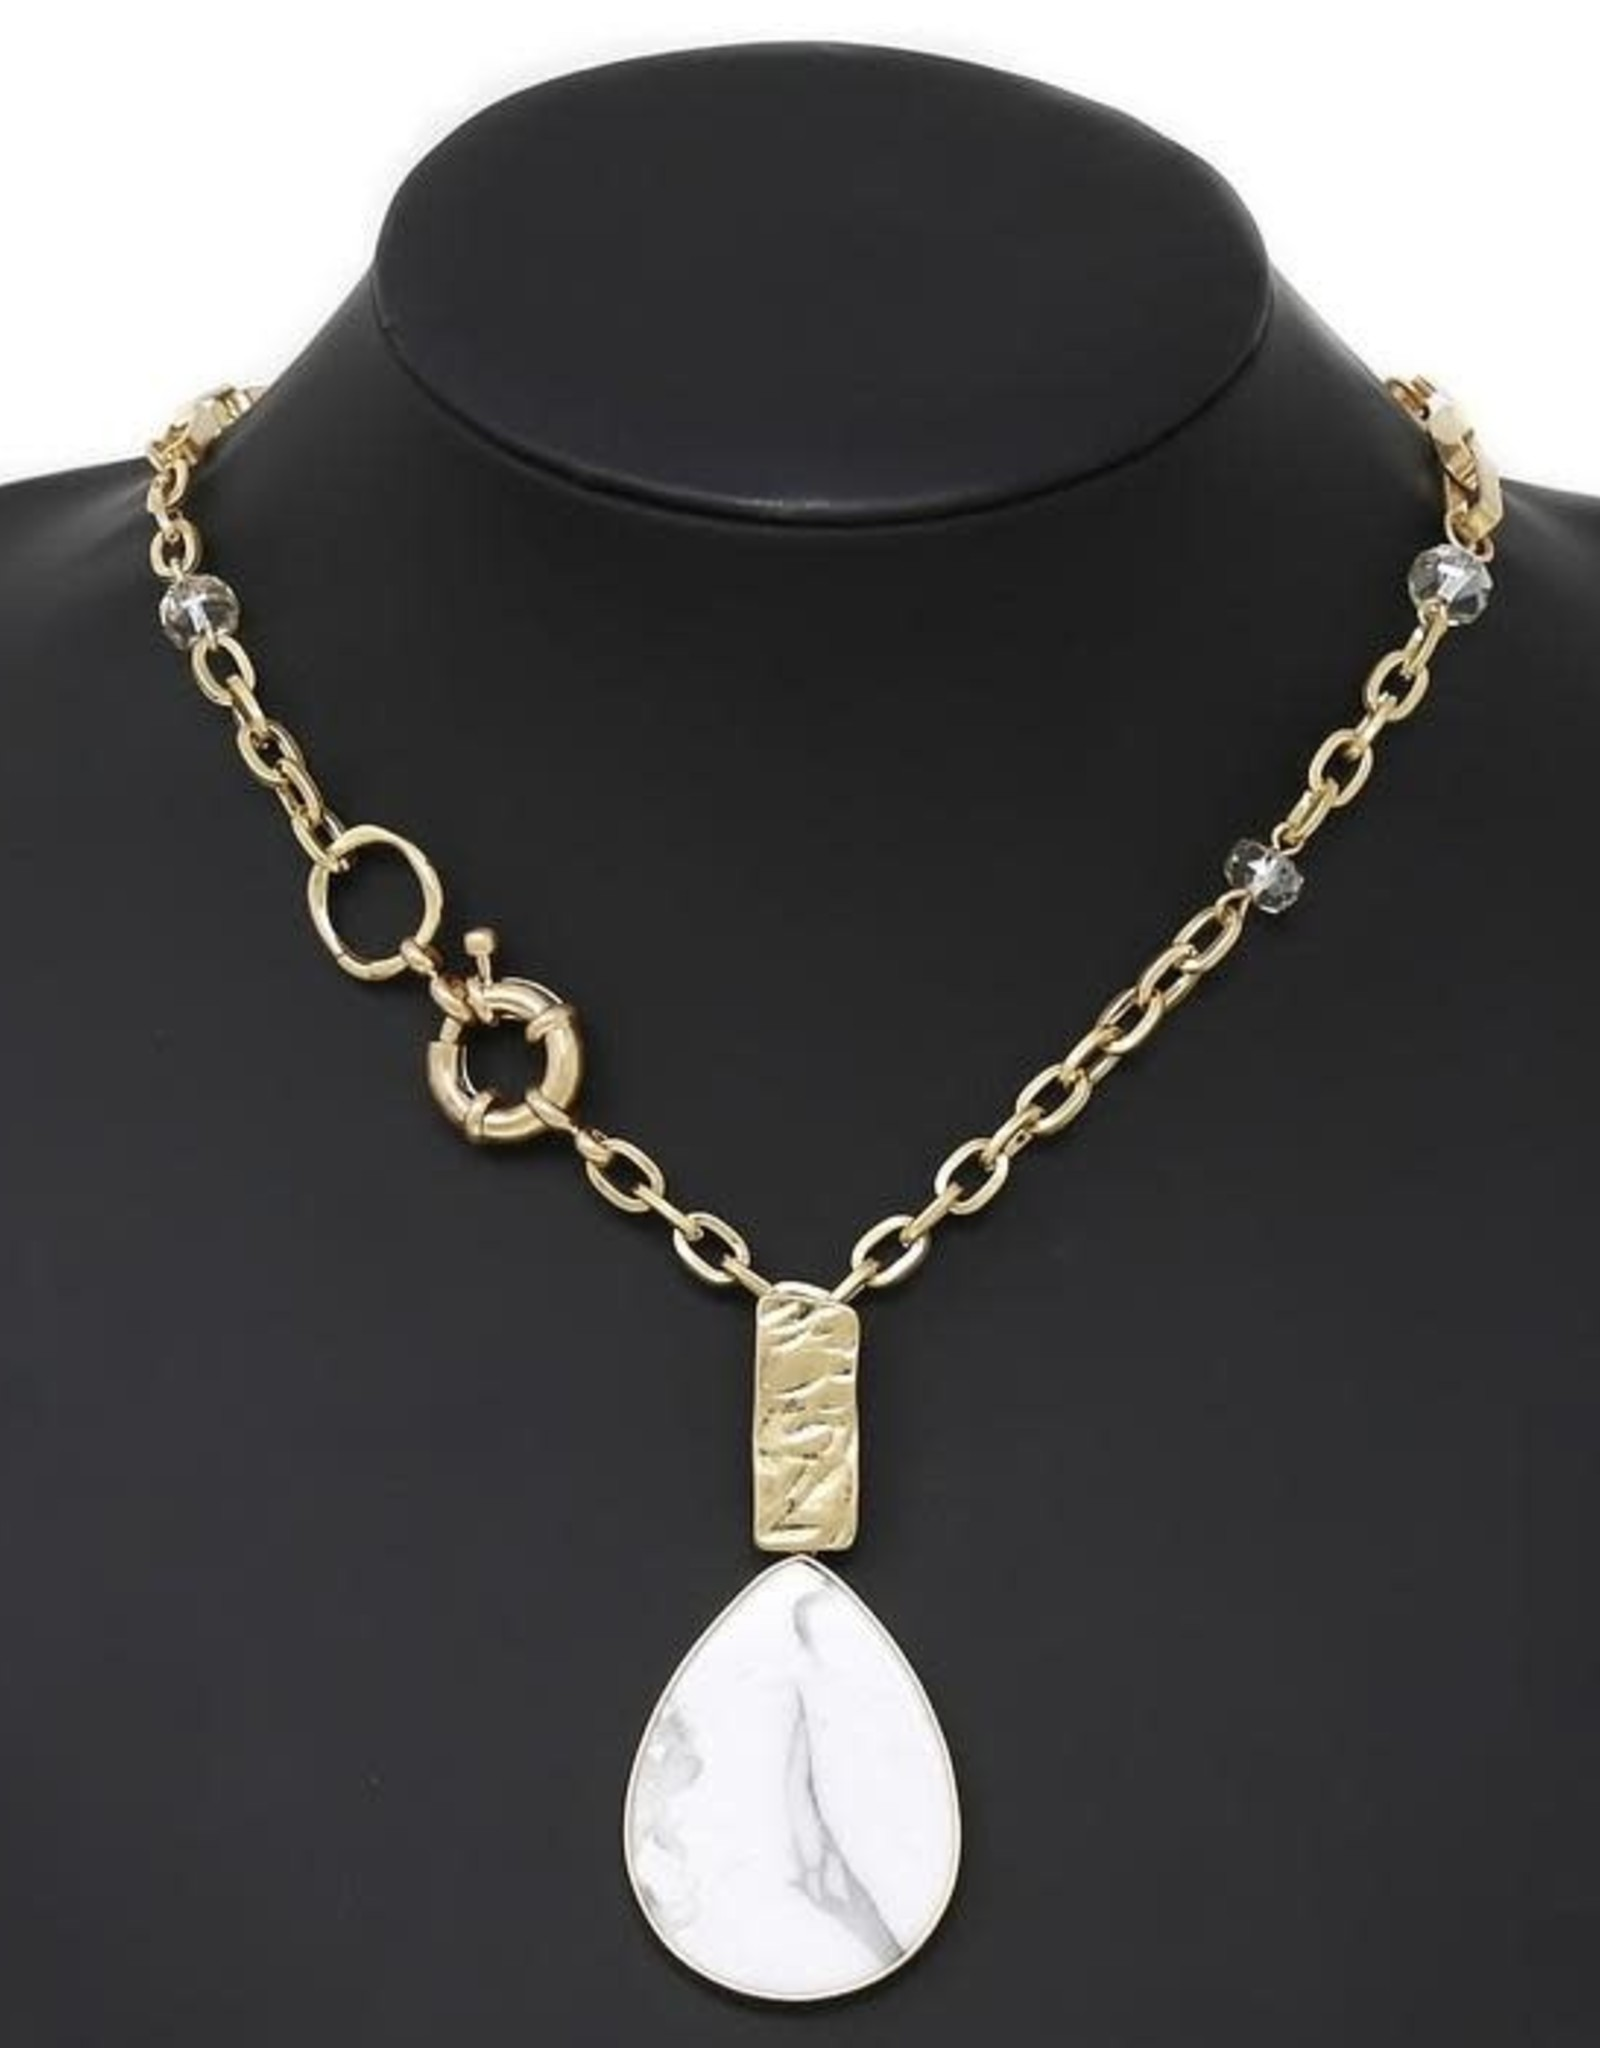 Natural Stone Pendant Necklace - White